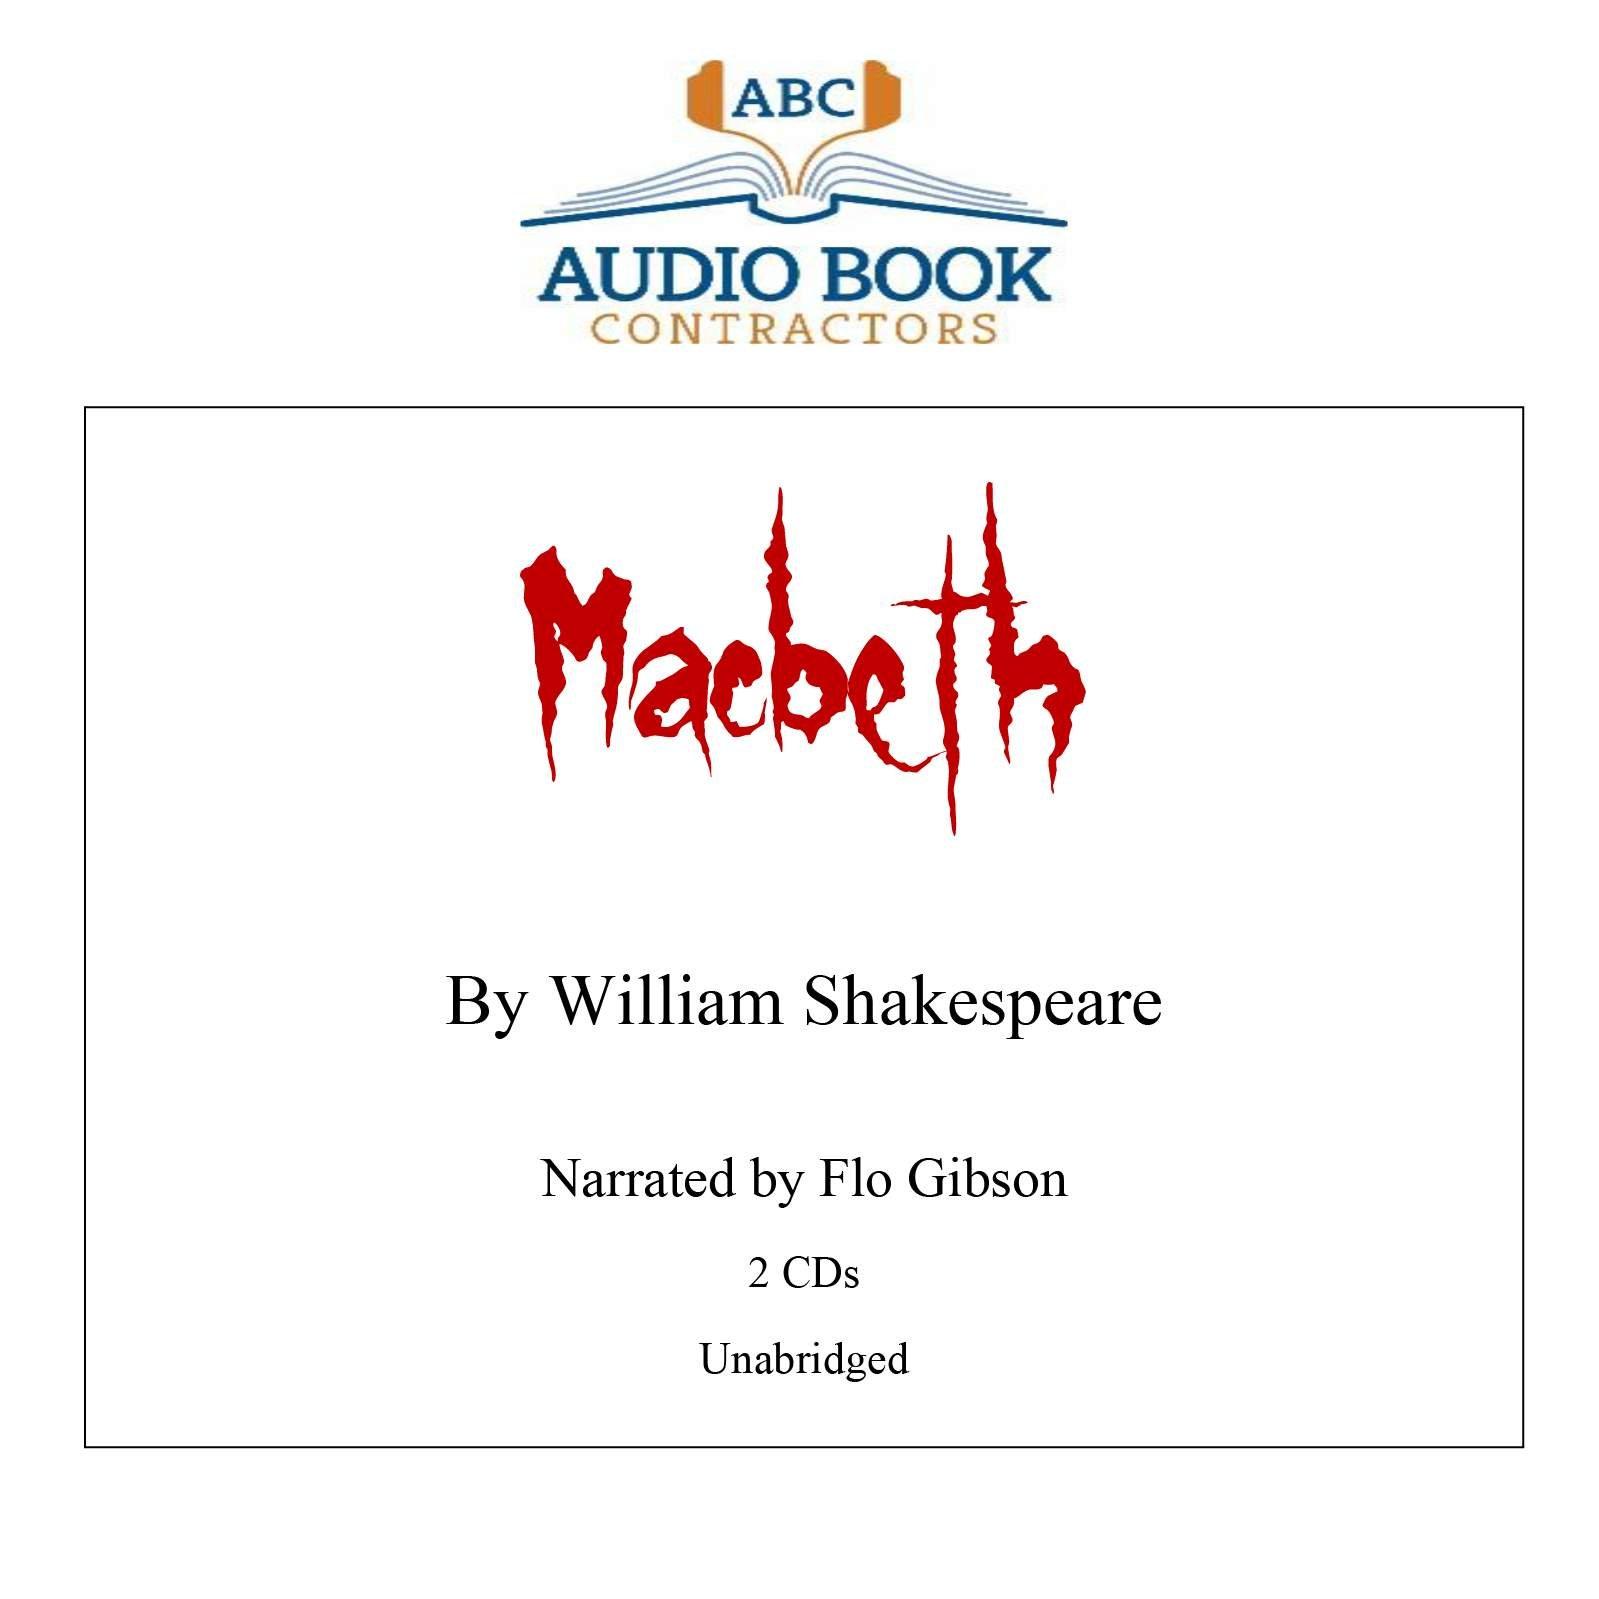 Macbeth (Classic Books on CD Collection) [UNABRIDGED]